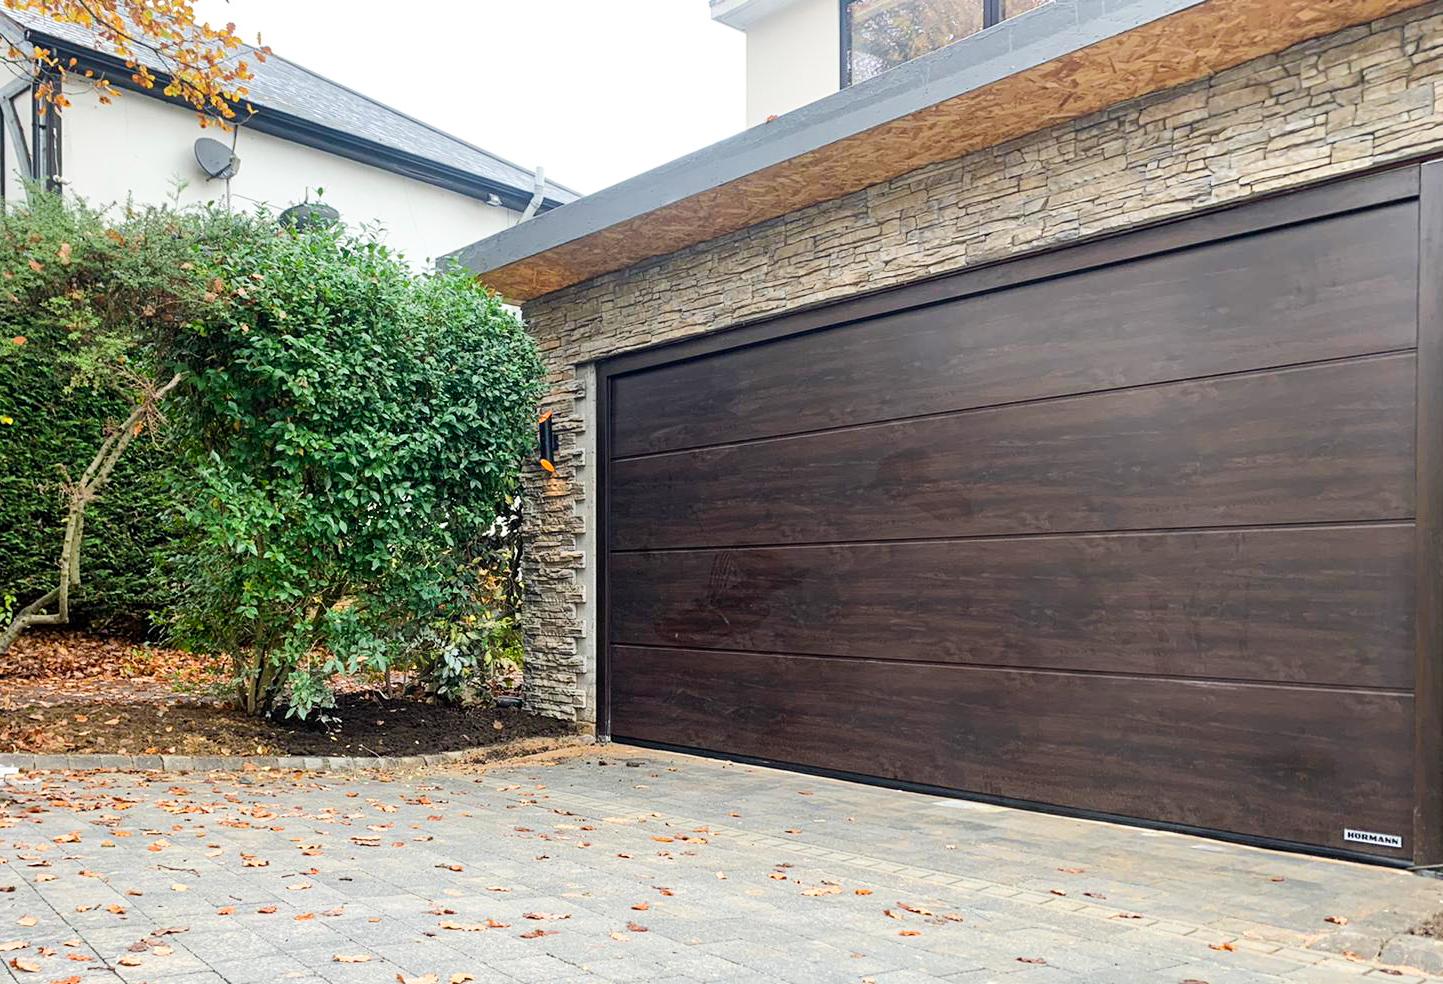 Hormann LPU 42 L Ribbed Insulated Sectional Garage Door